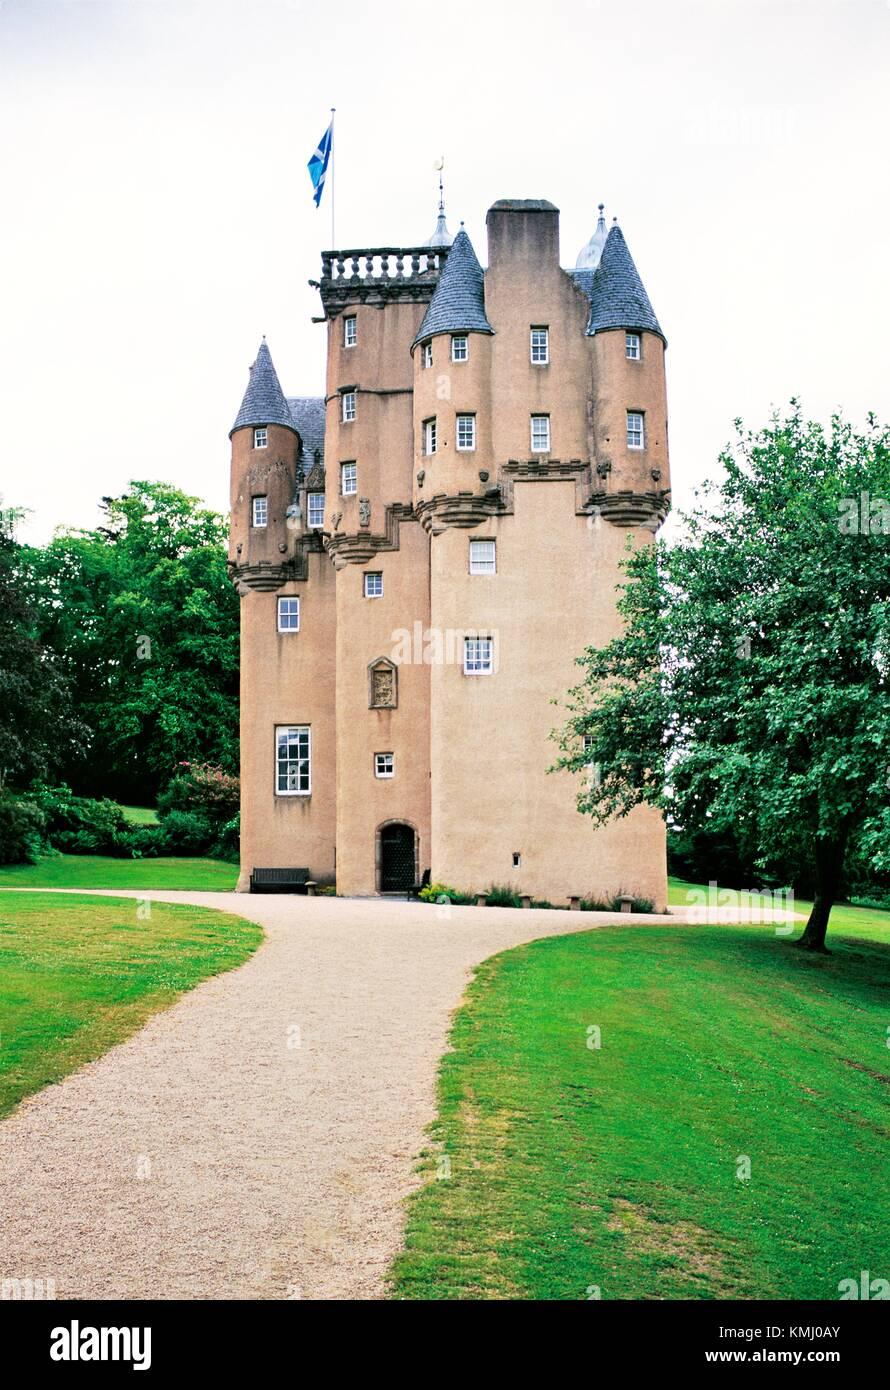 Craigievar Castle, Alford, Grampian Region, Scotland. Classic Scottish Baronial style completed in 1626 - Stock Image